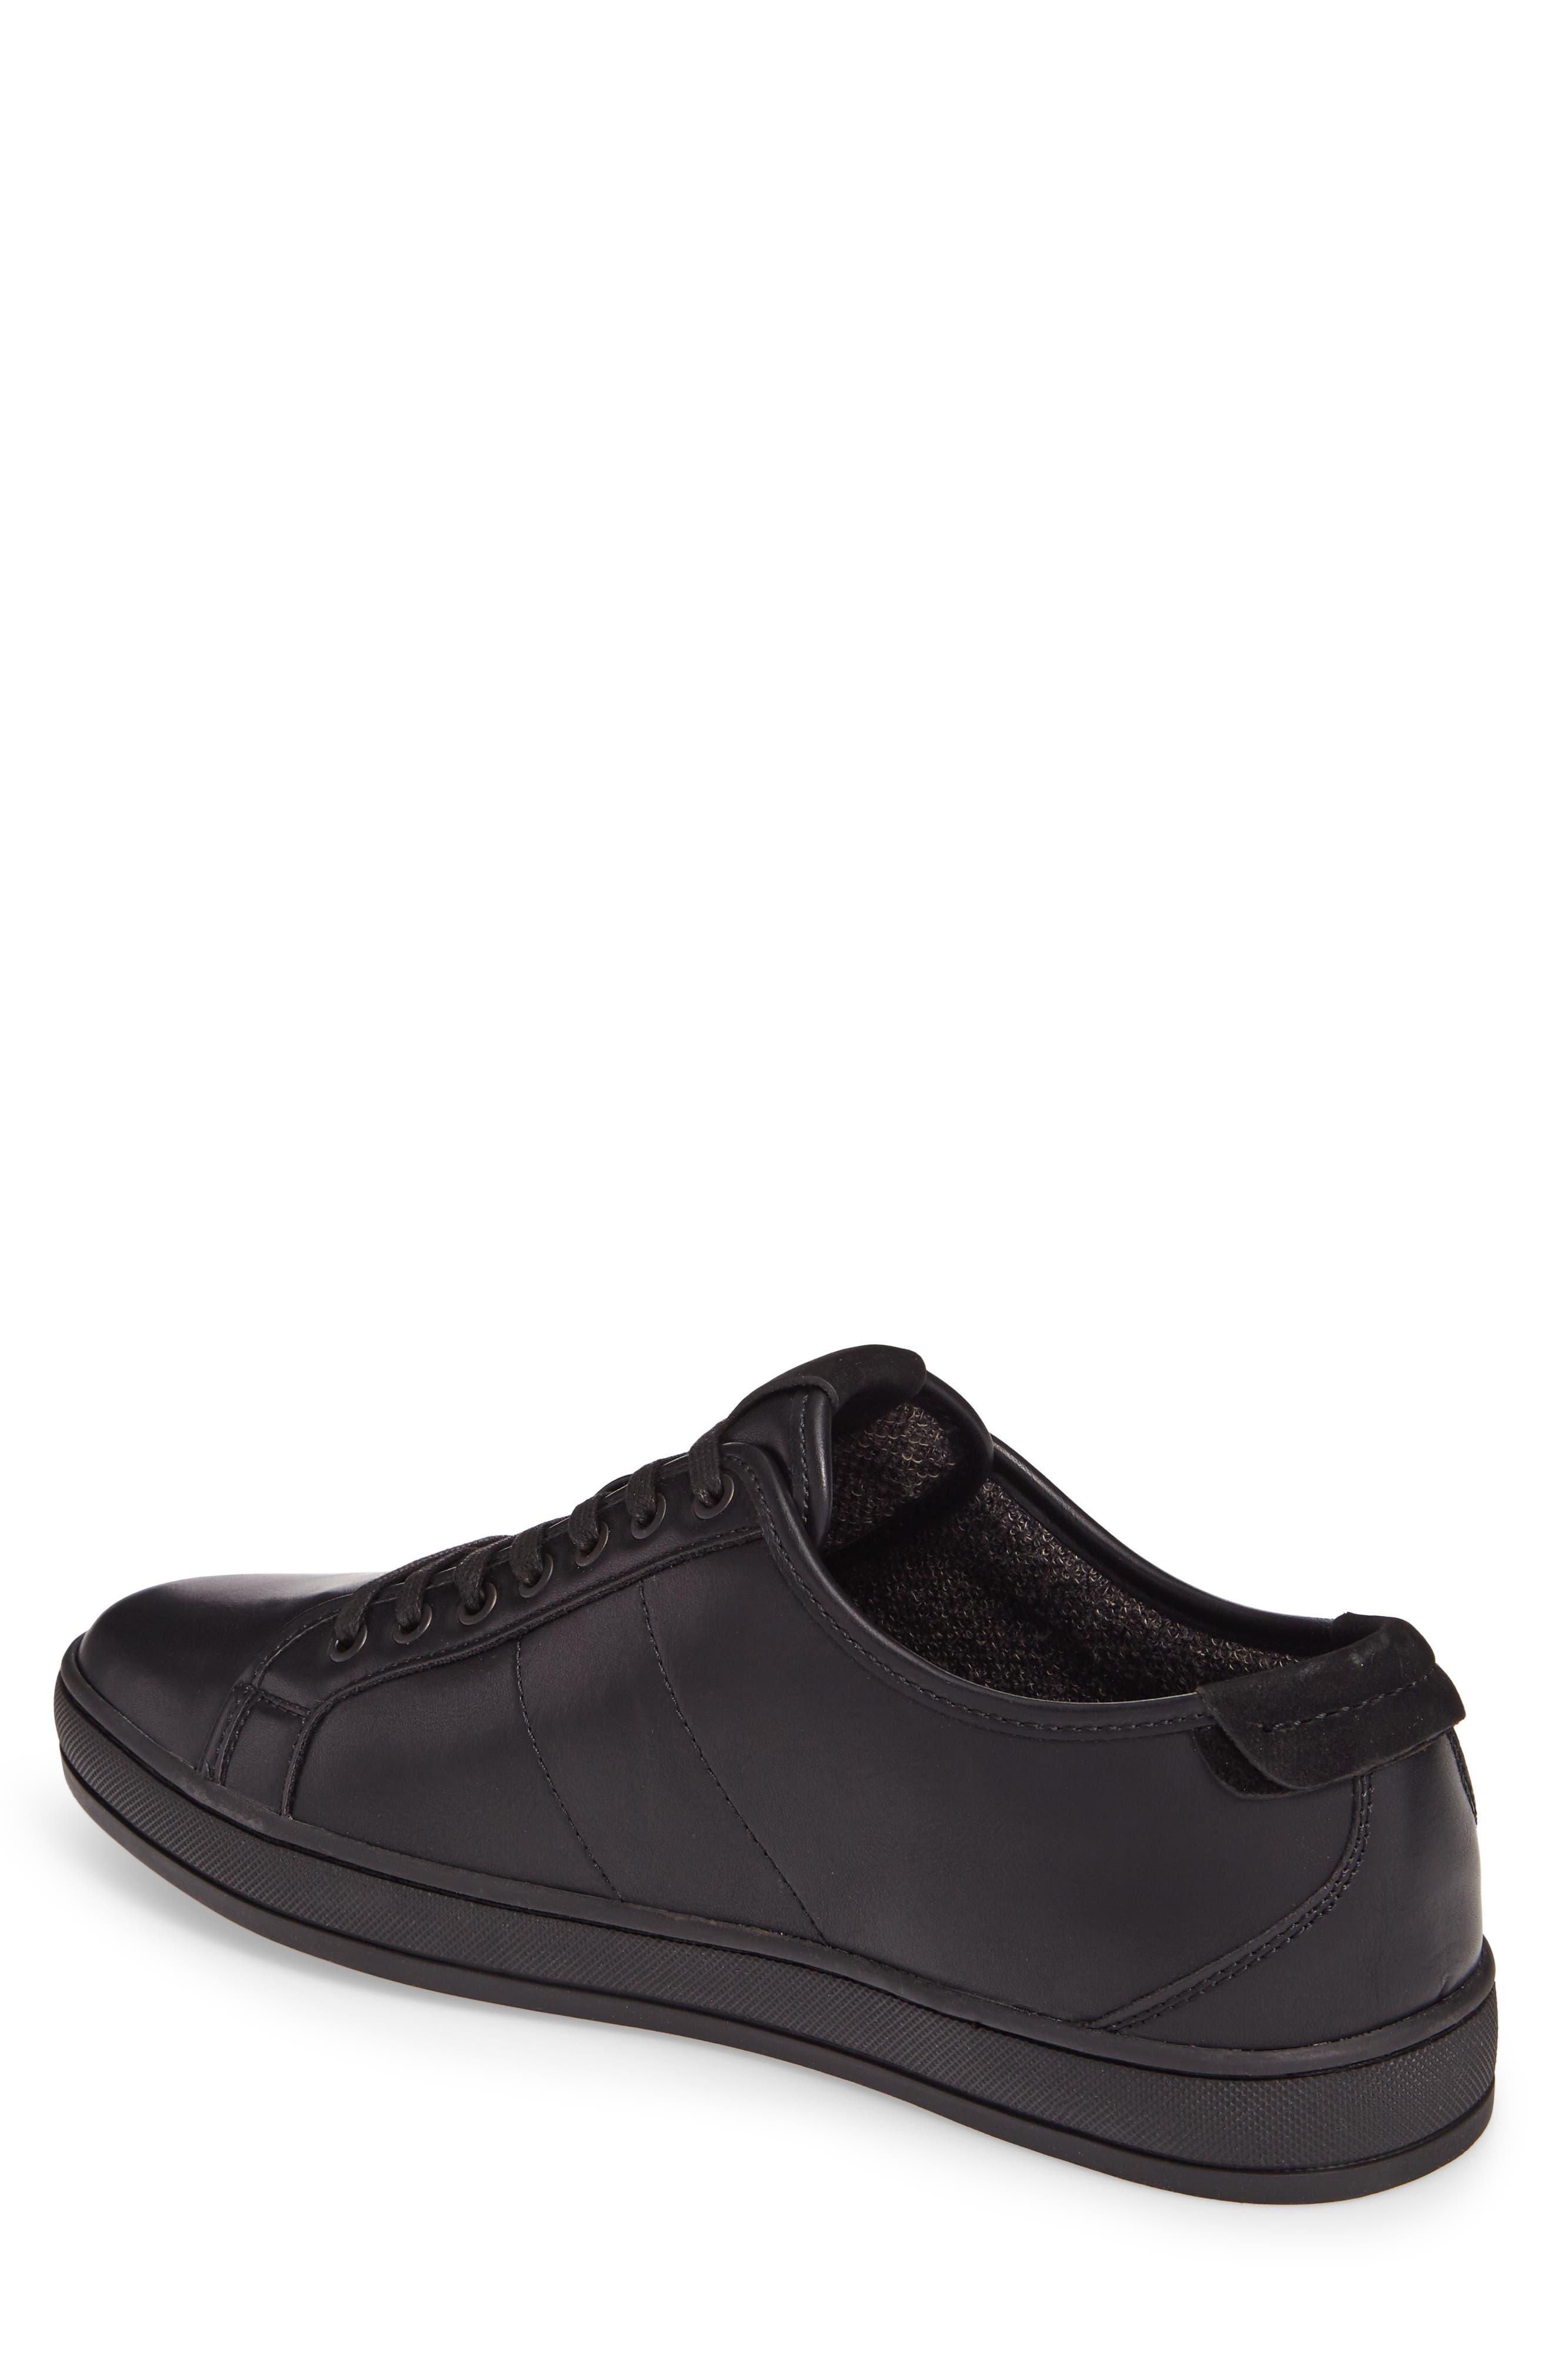 Alternate Image 2  - ALDO Delello Low-Top Sneaker (Men)